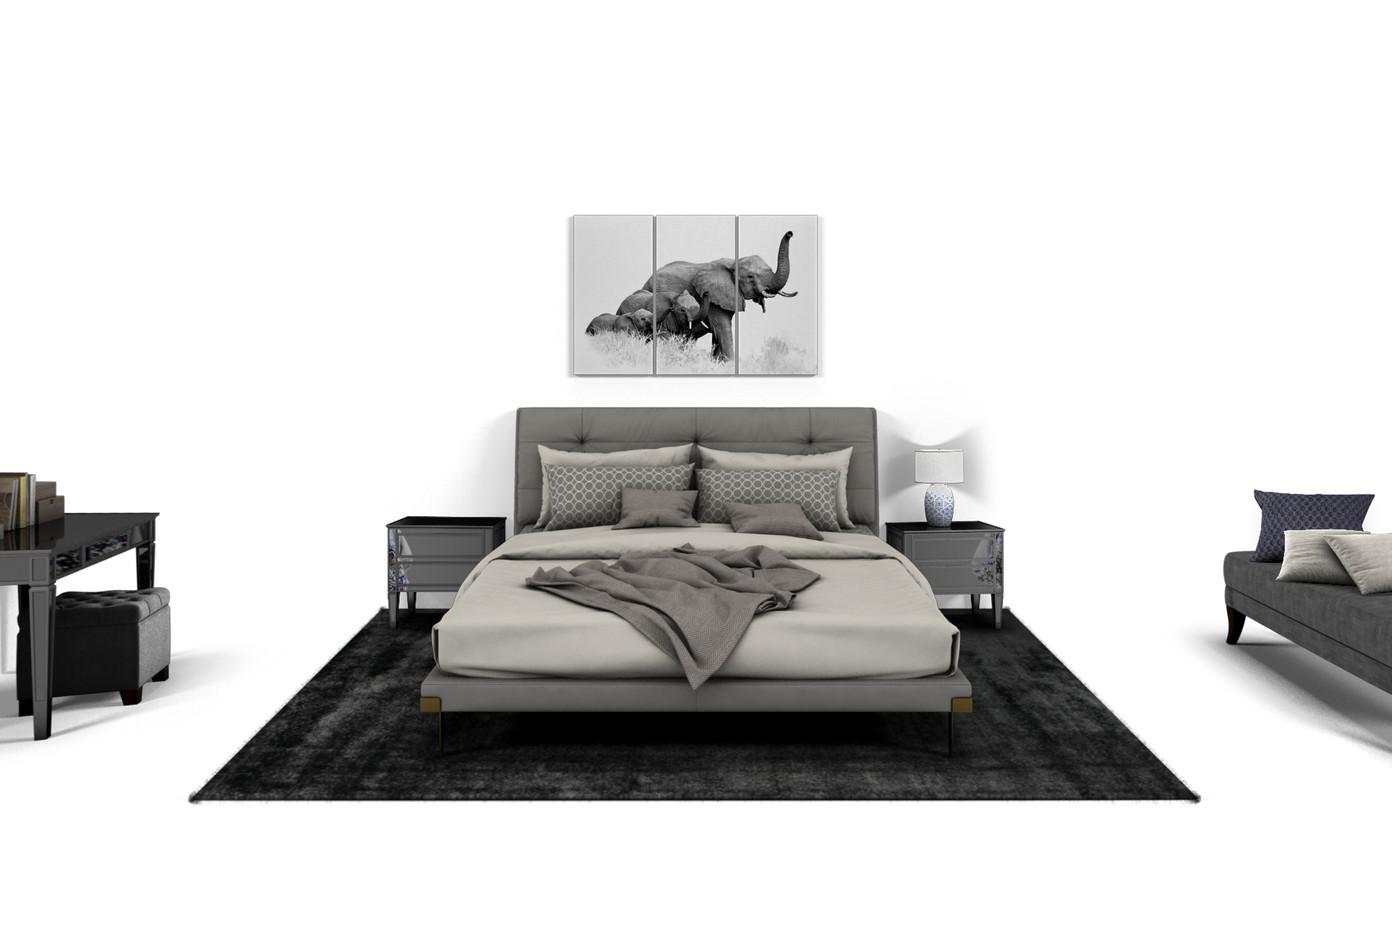 Bedroom Contemporary 10.jpg